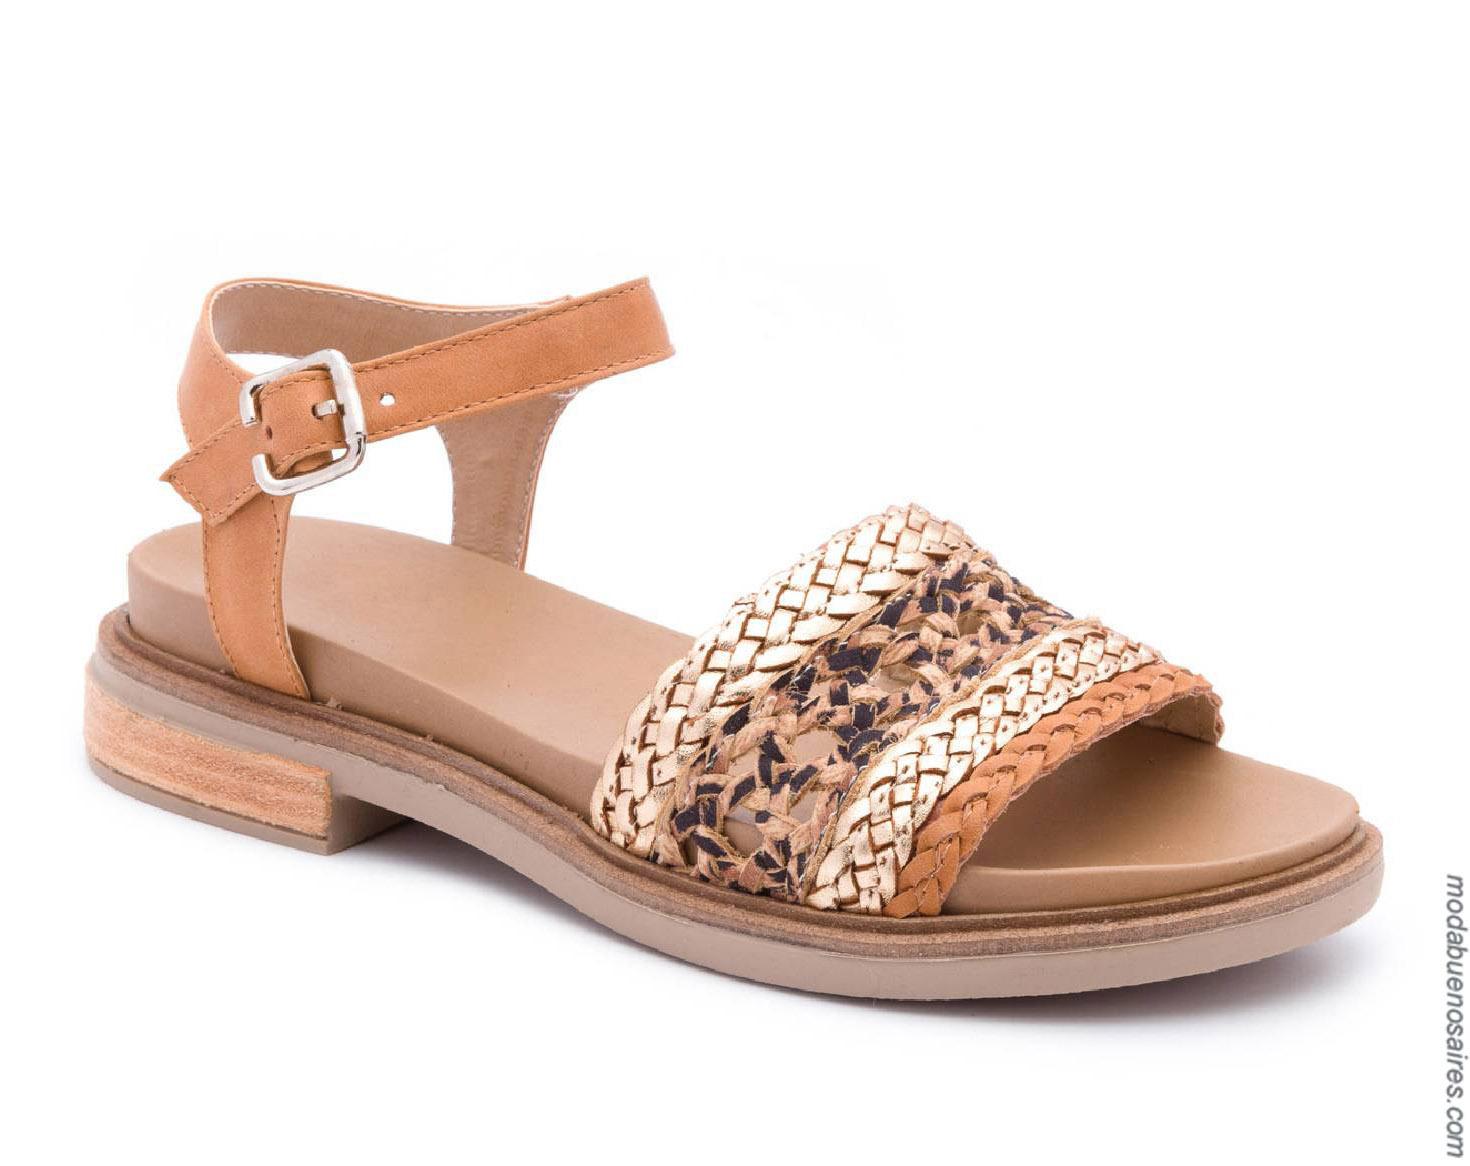 Moda sandalias primavera verano 2020. Moda calzados primavera verano 2020.